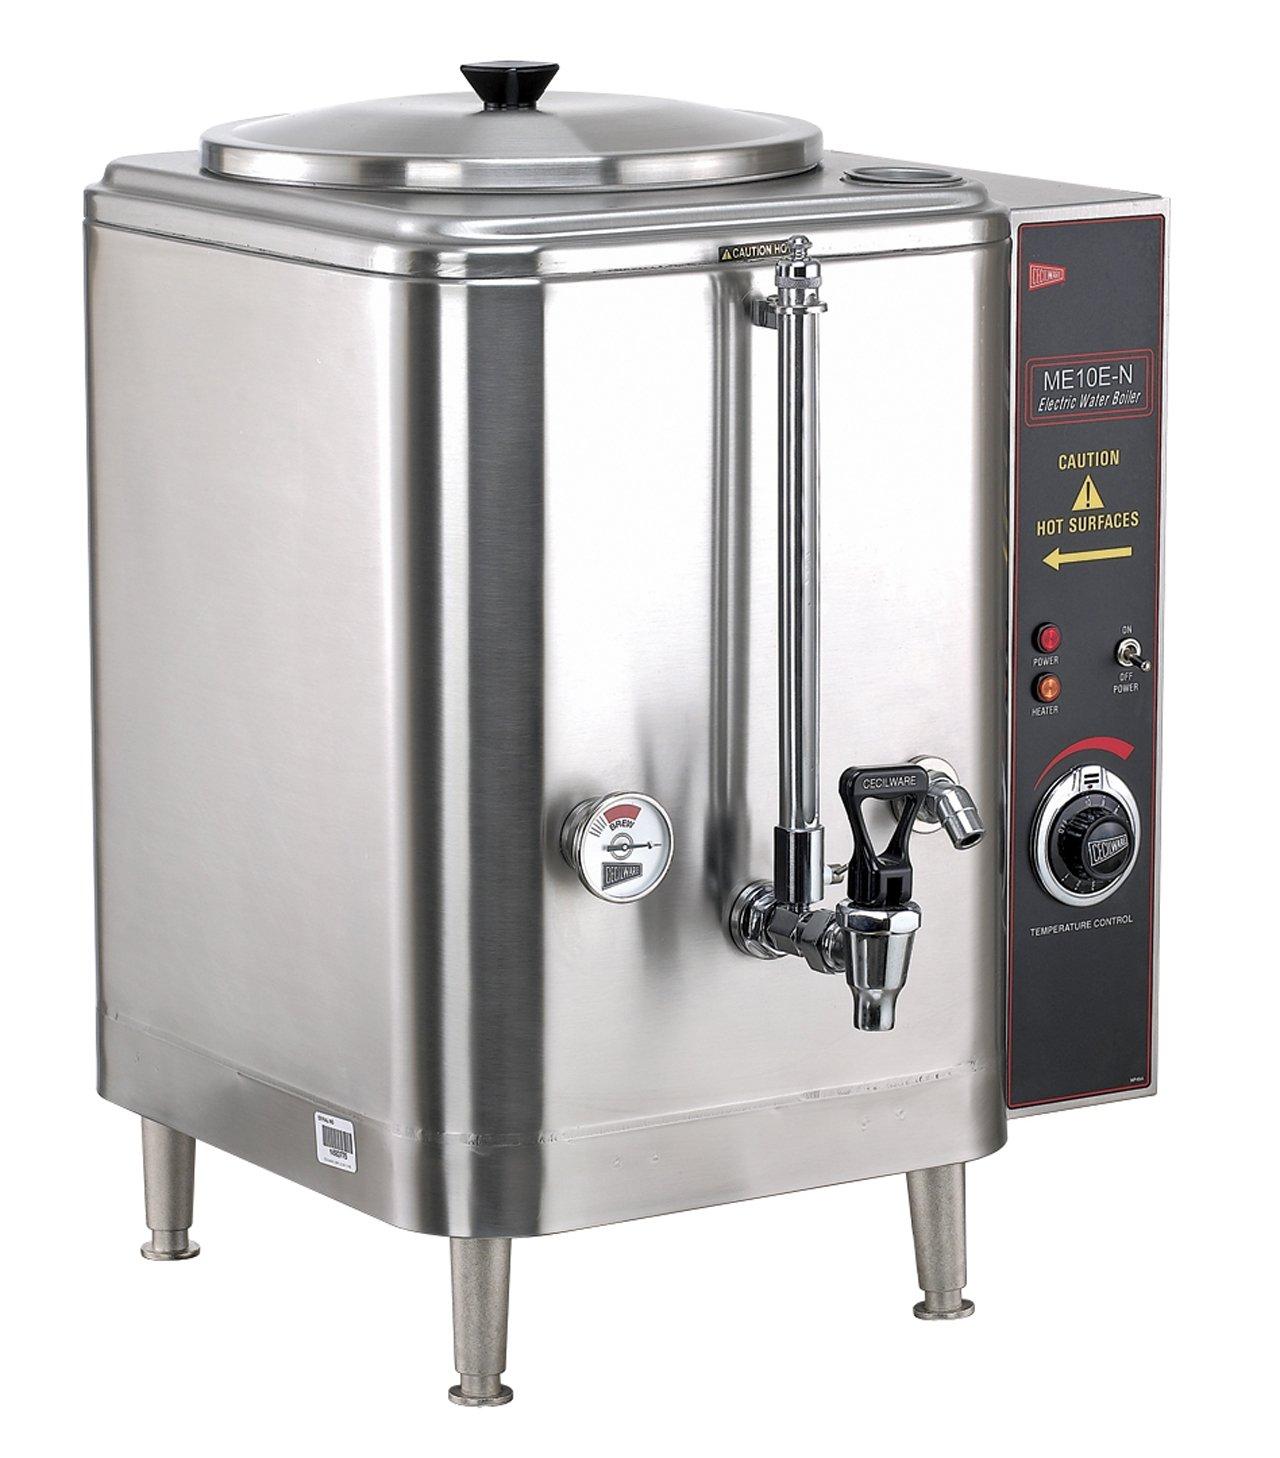 Grindmaster-Cecilware ME15EN 120-volt/1pH Electric Water Boiler, 15-Gallon